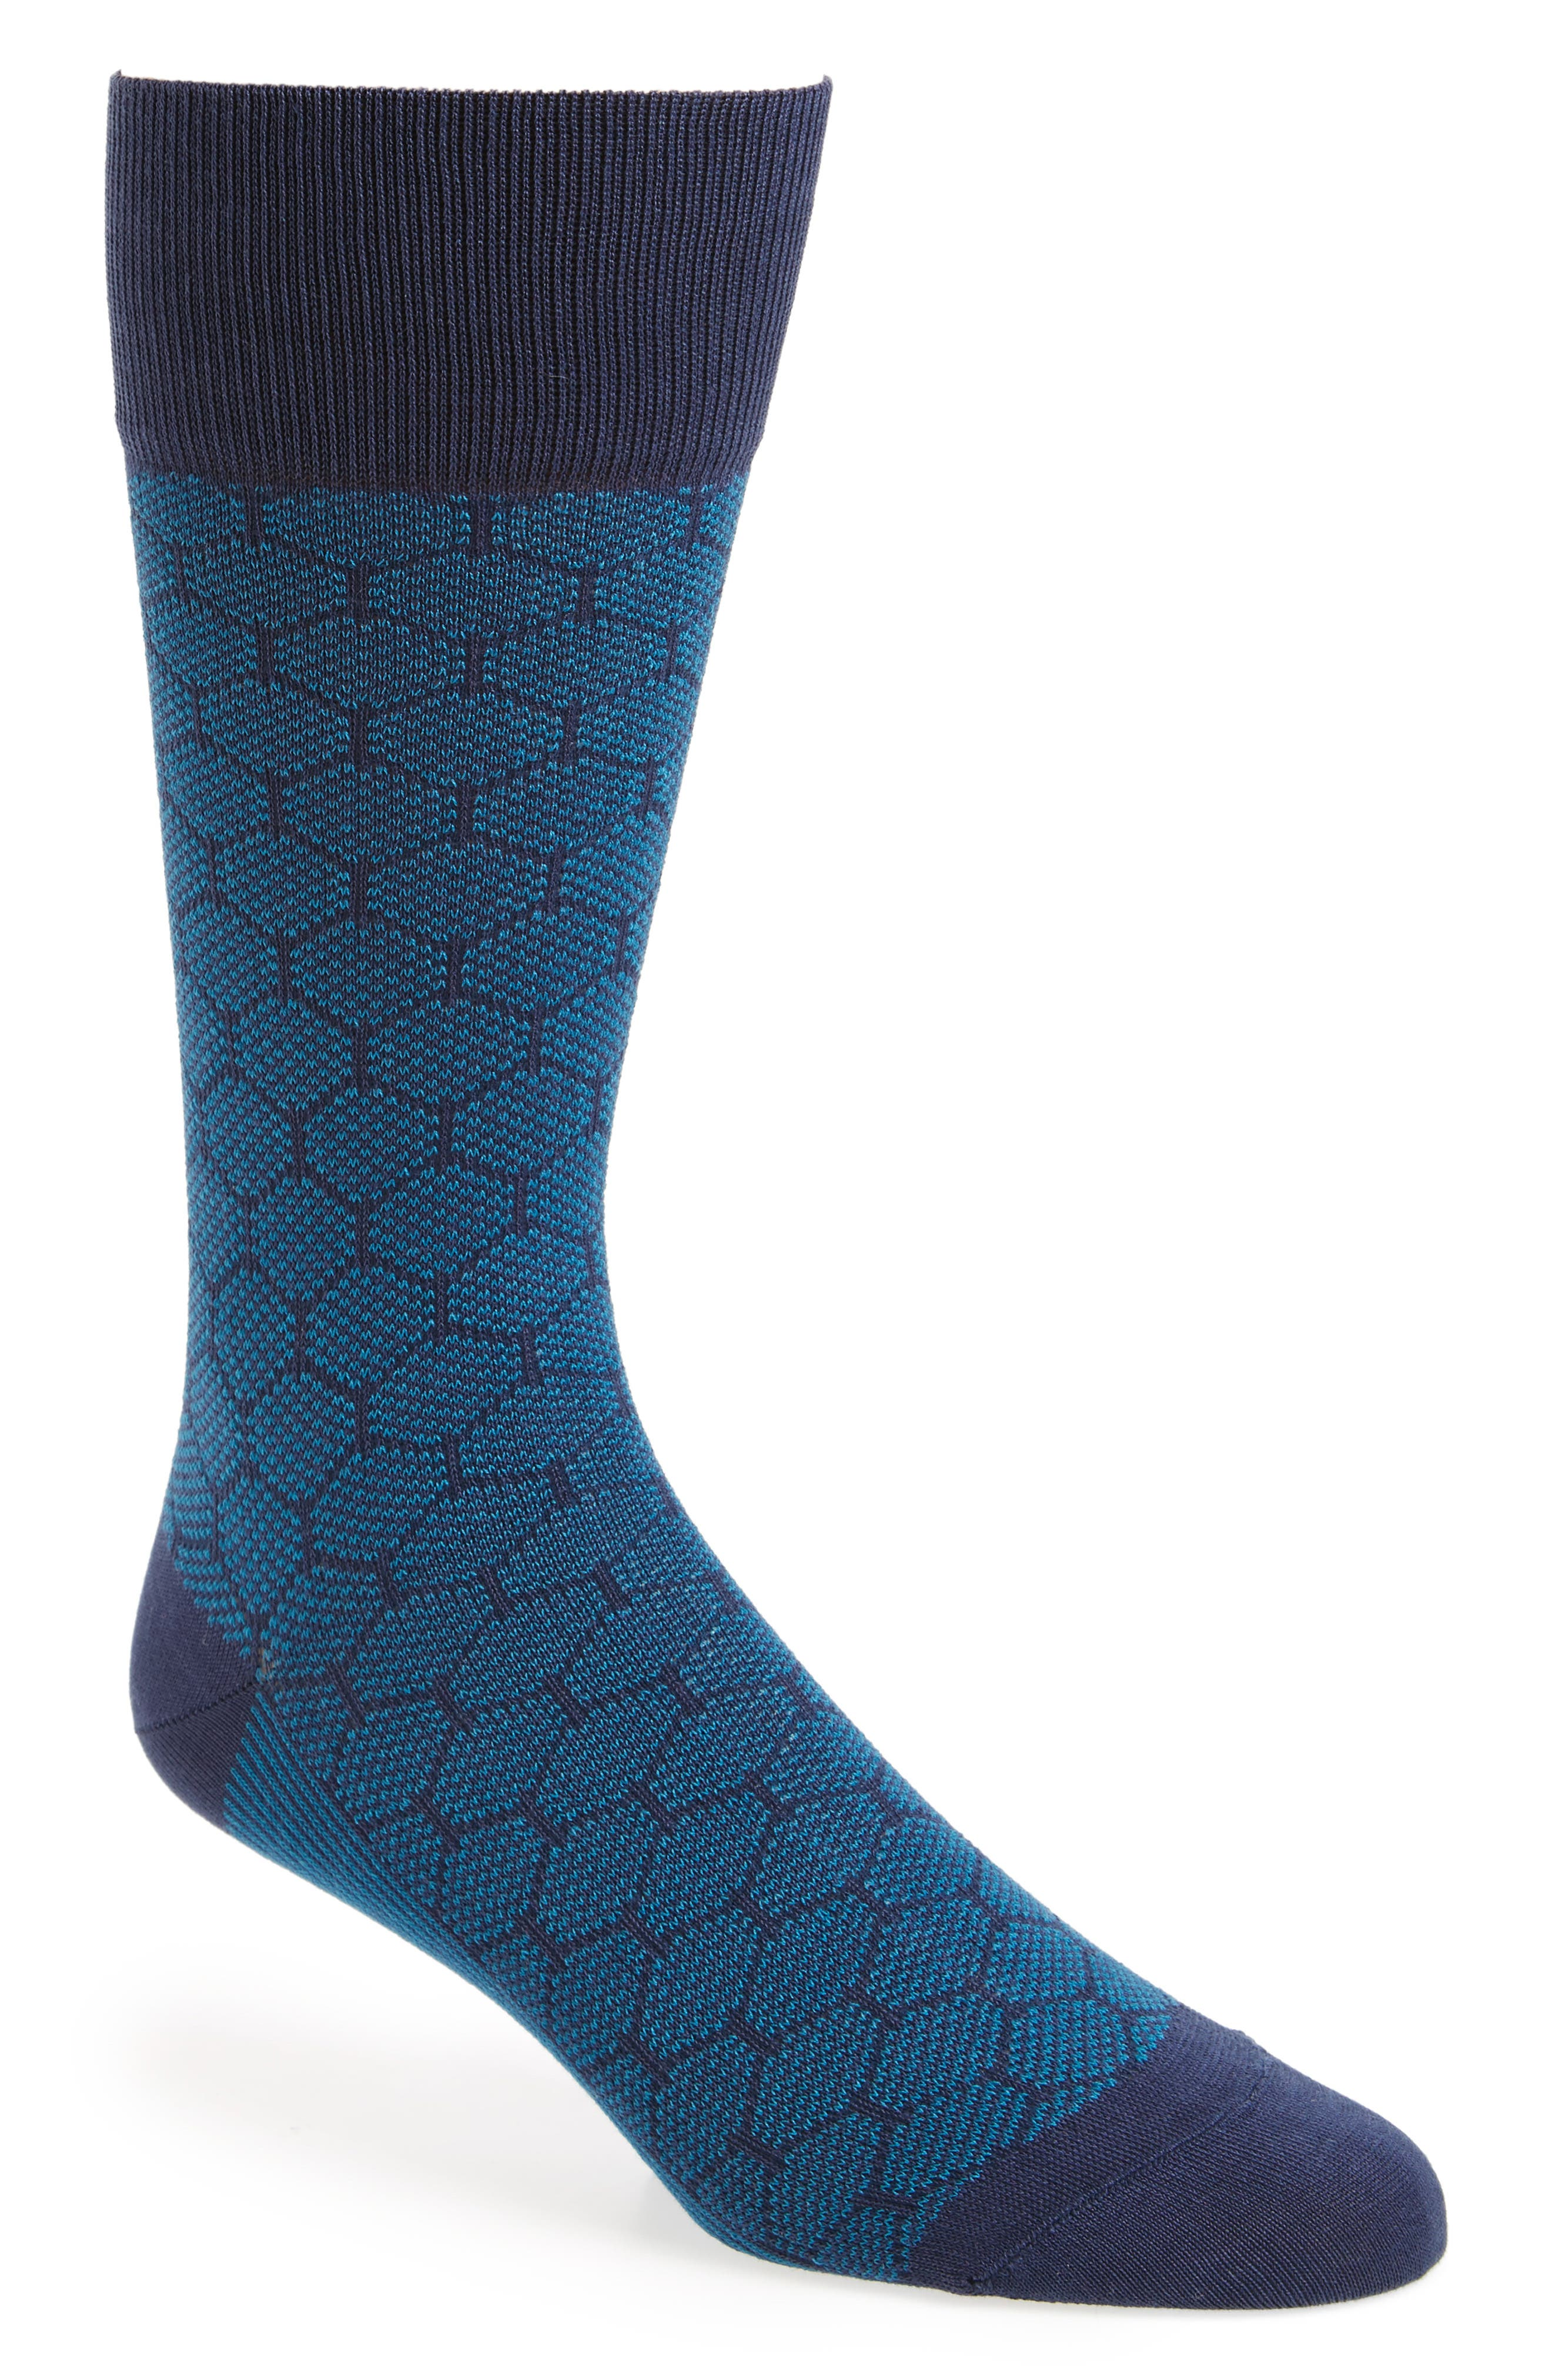 Mercerized Honeycomb Socks,                             Main thumbnail 1, color,                             Blue/ Navy